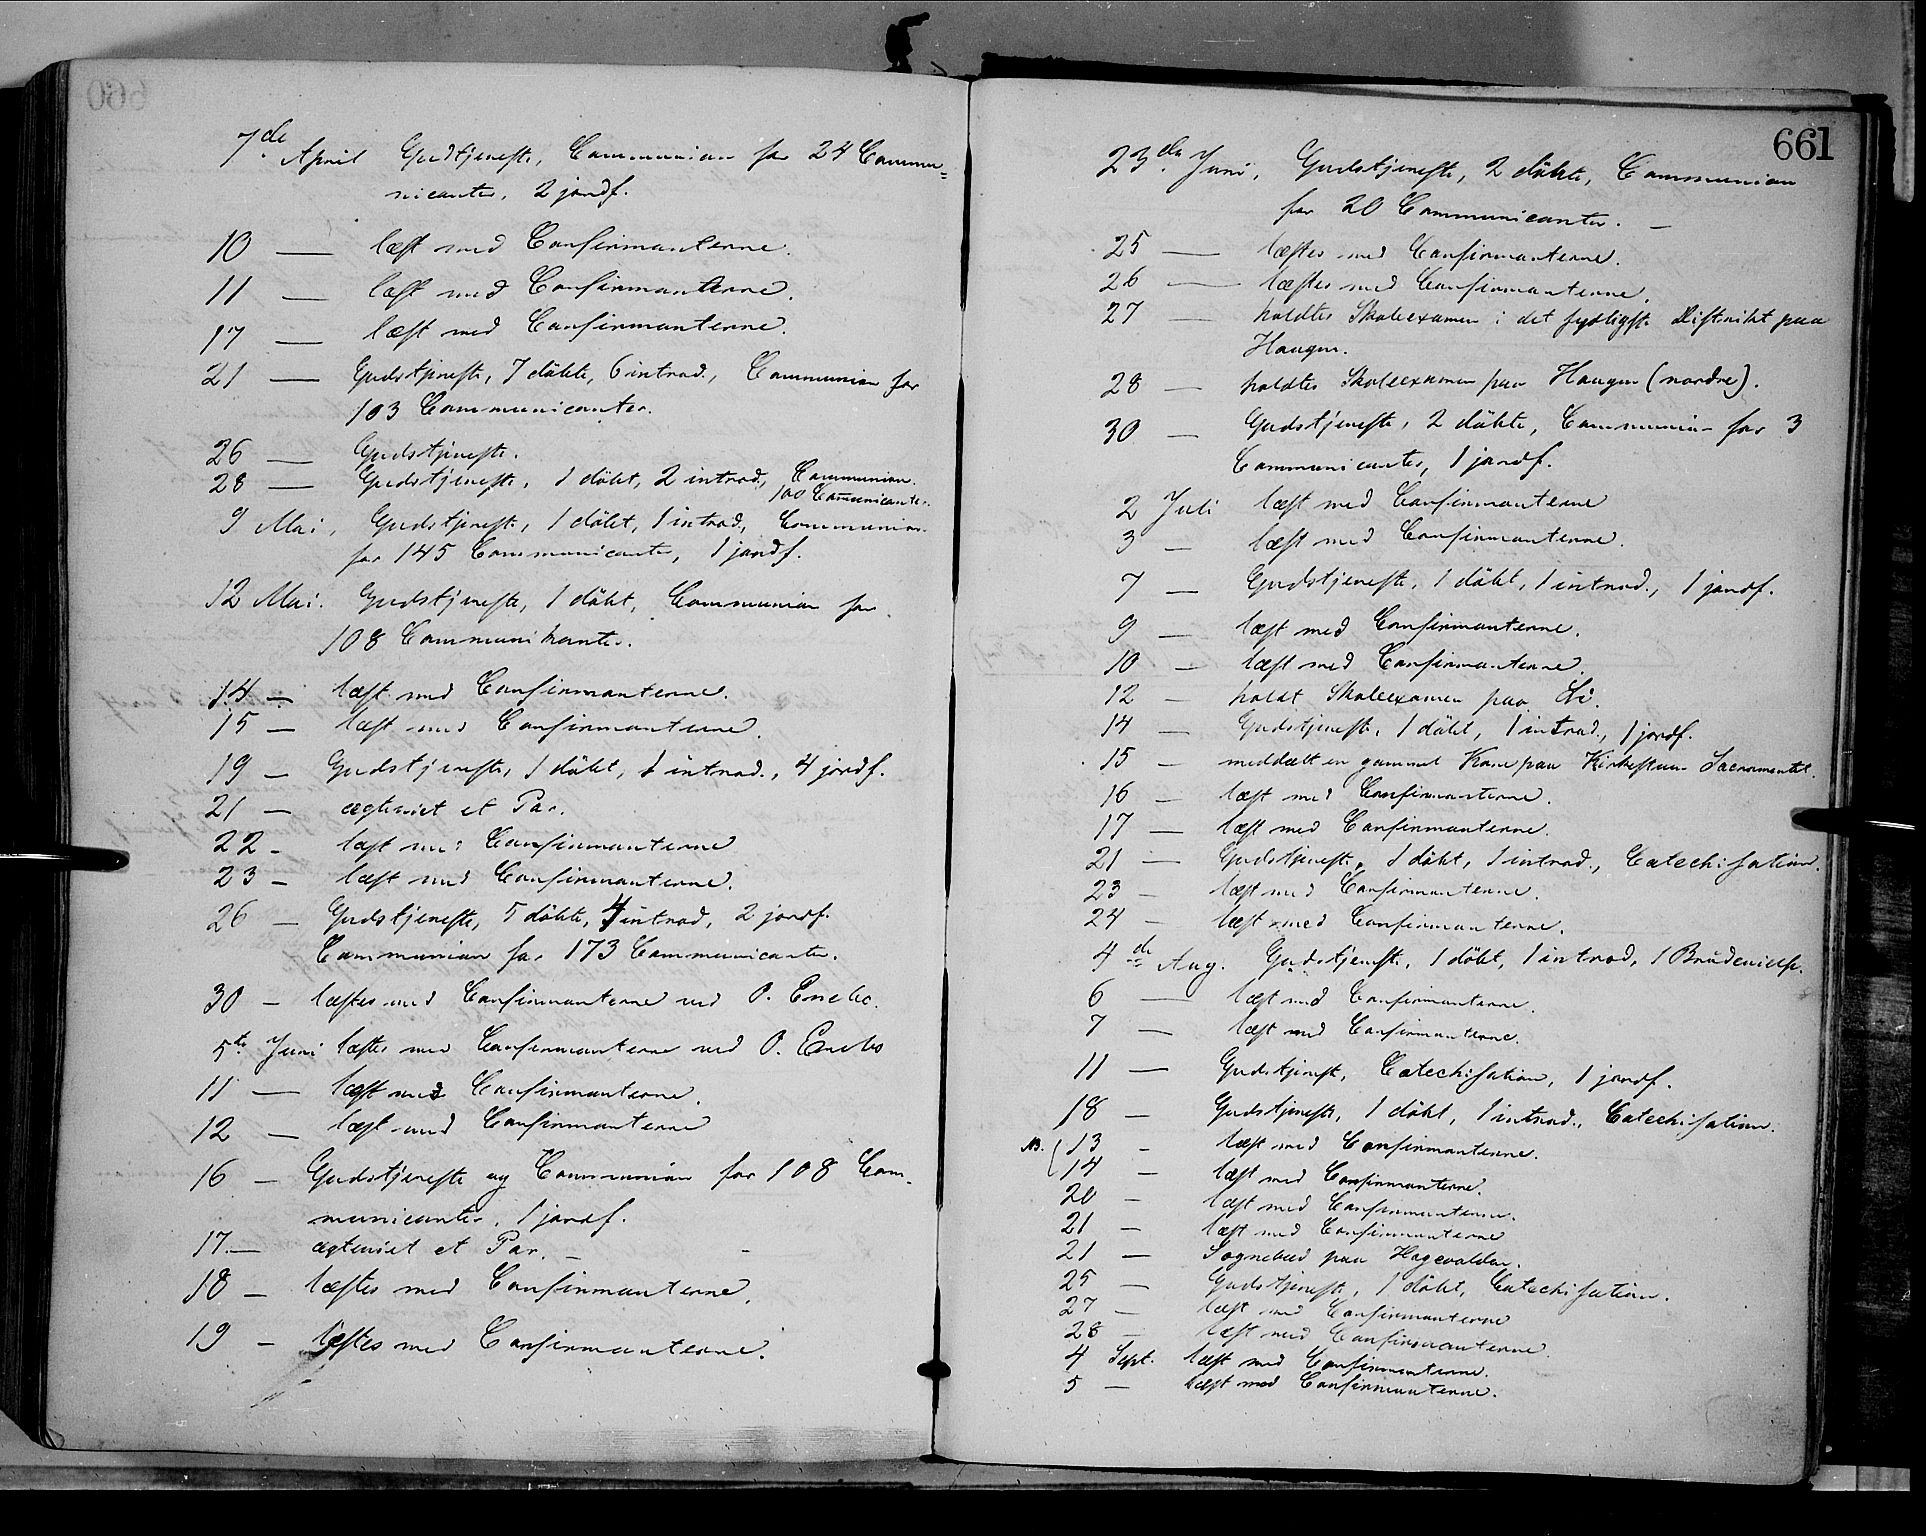 SAH, Dovre prestekontor, Ministerialbok nr. 1, 1854-1878, s. 661